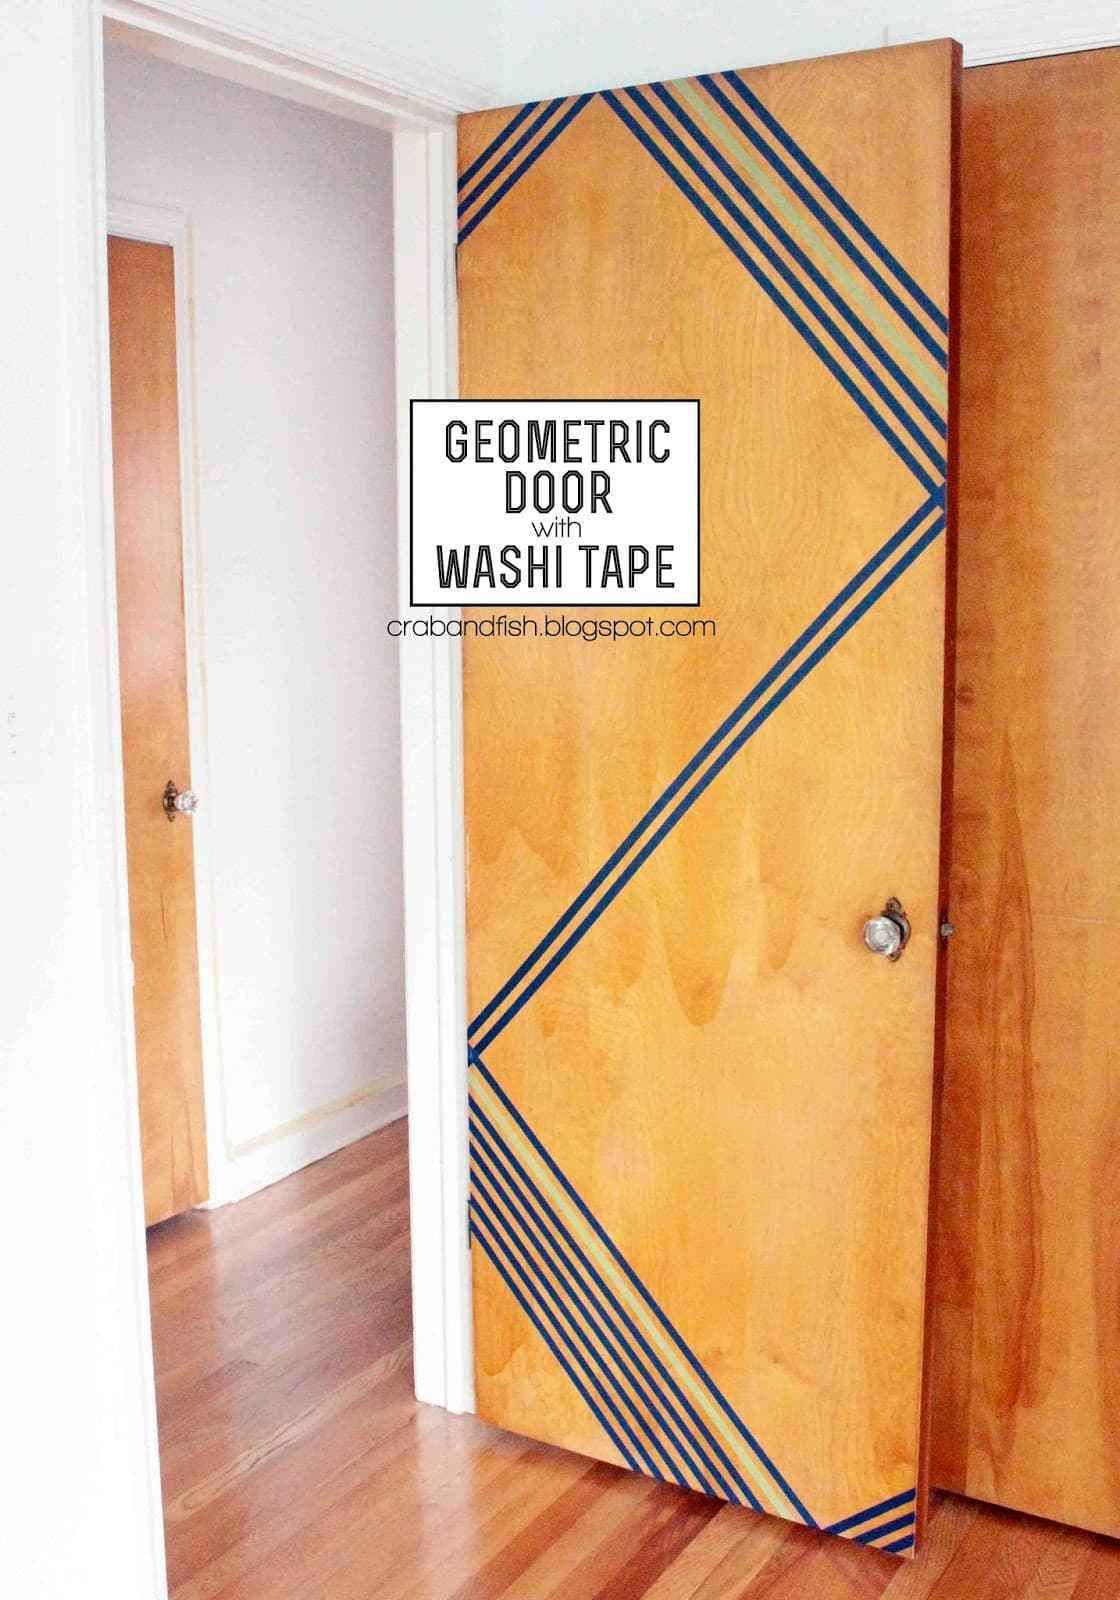 Dorm Room Decor 101: Make Your Front Door Fab images